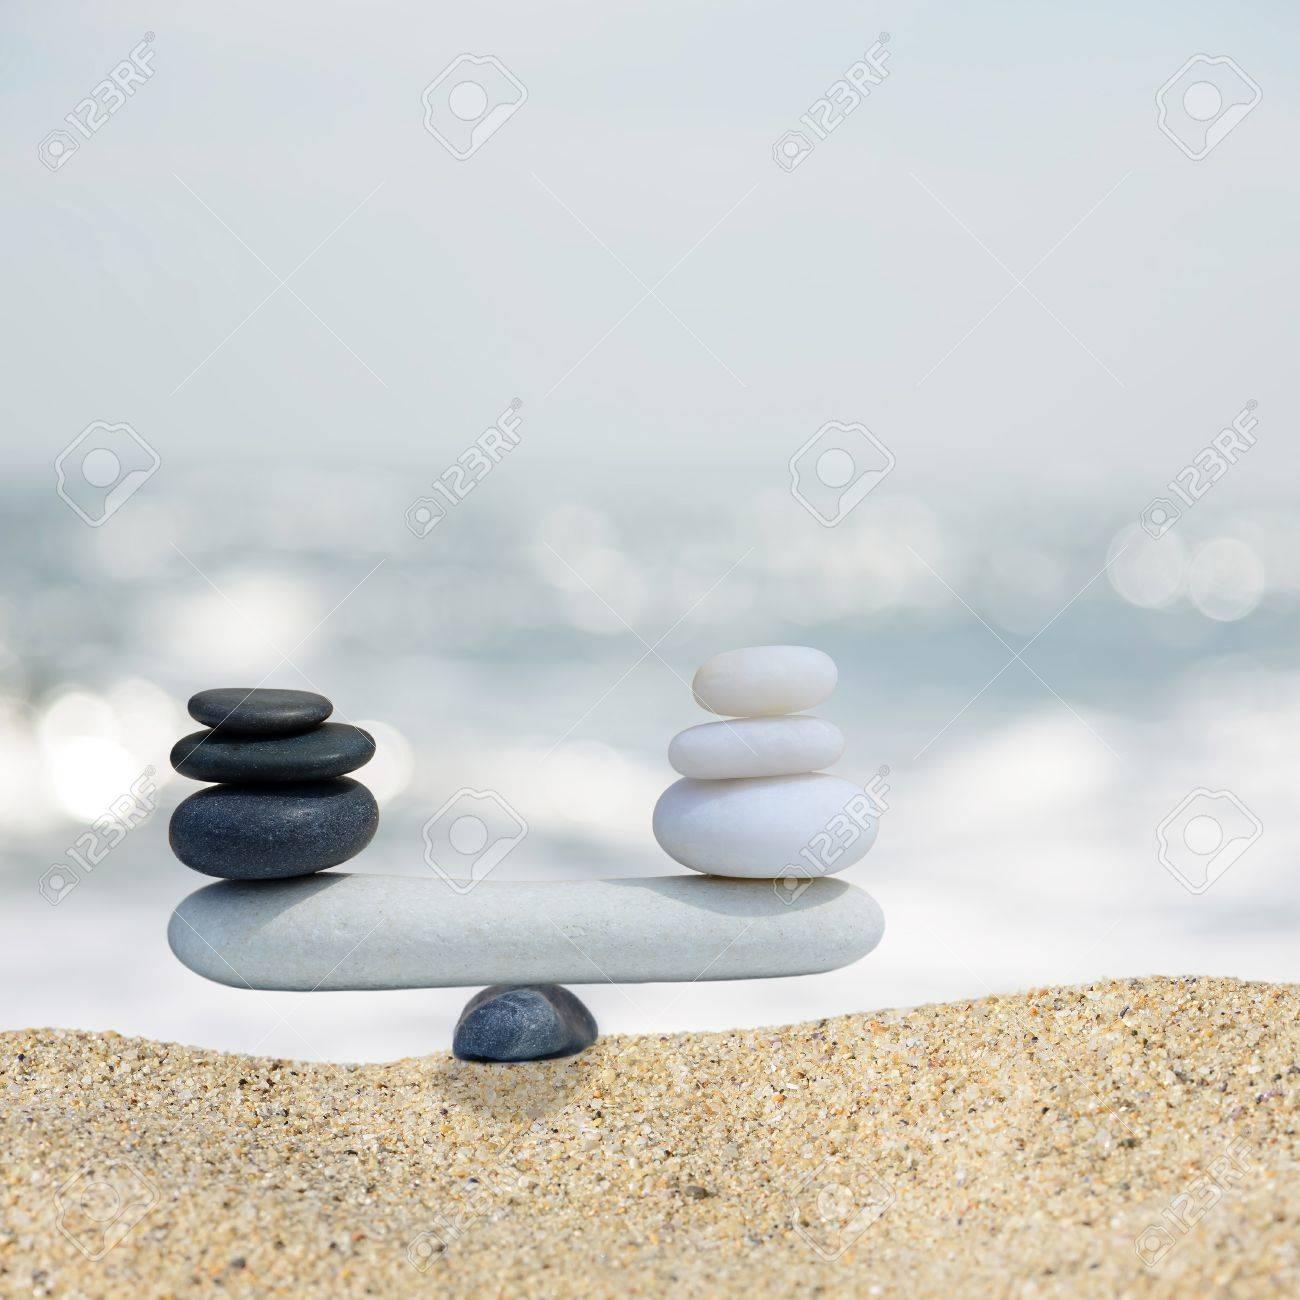 Zen Stones Balance Concept The Balance Between Black And White